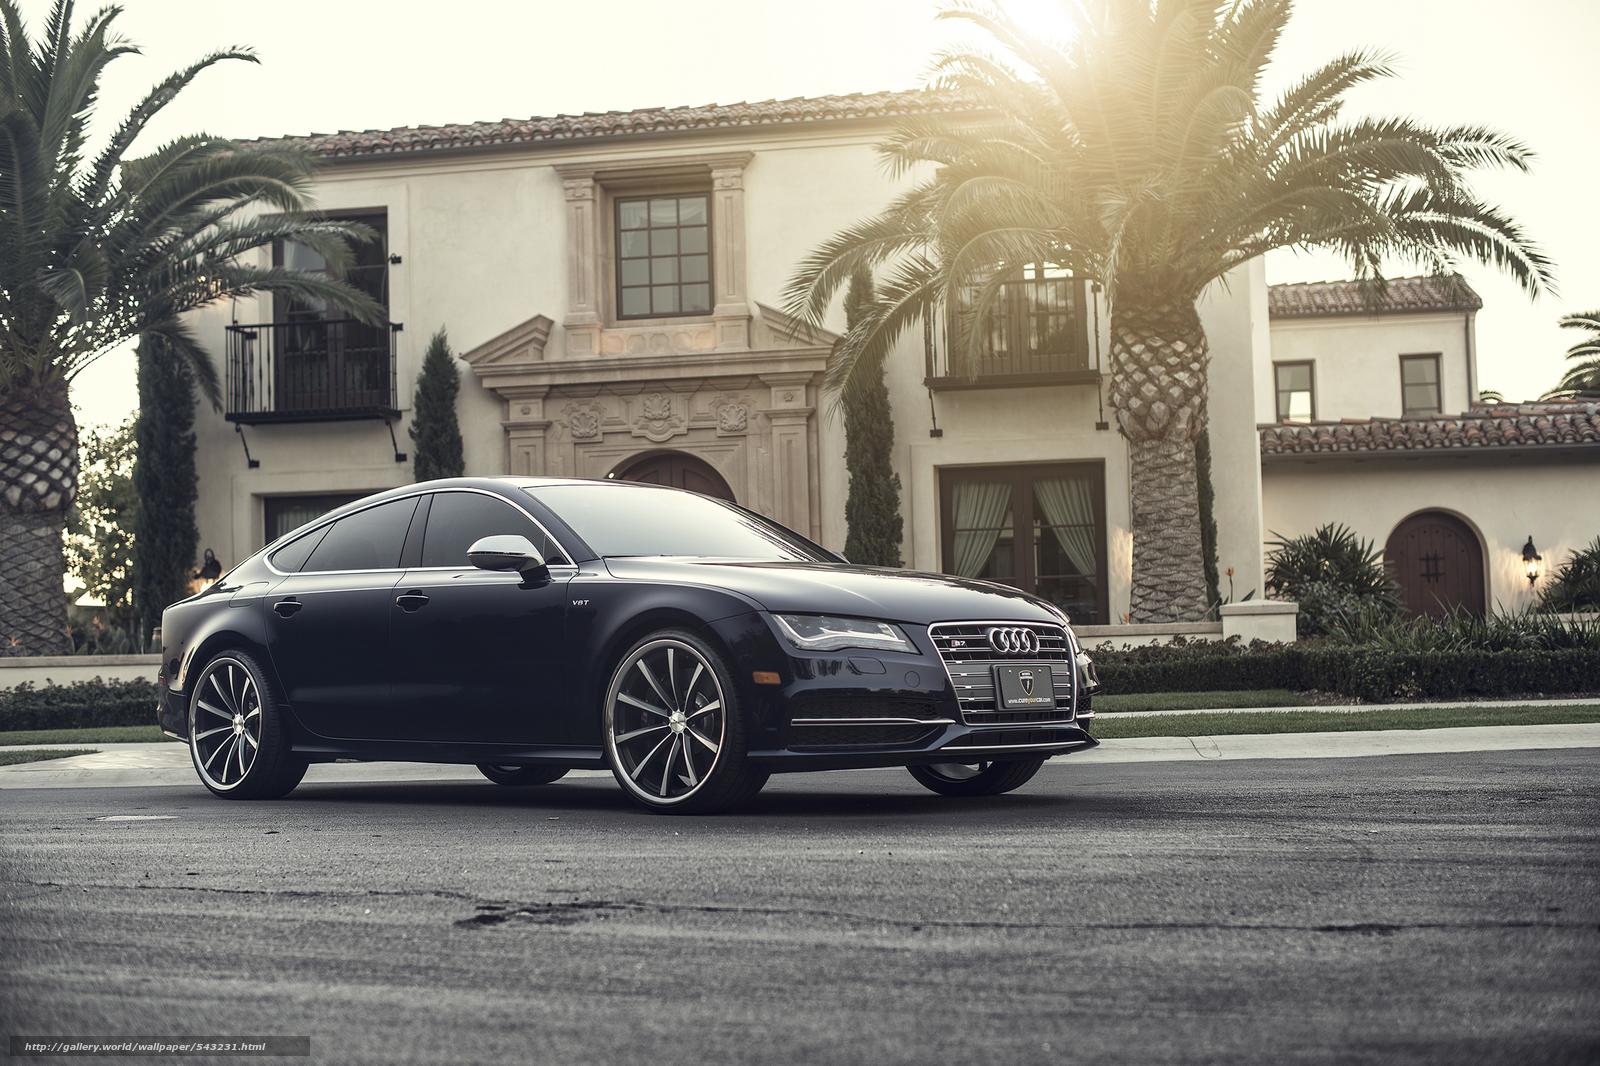 Audi Rs7 Matte Black